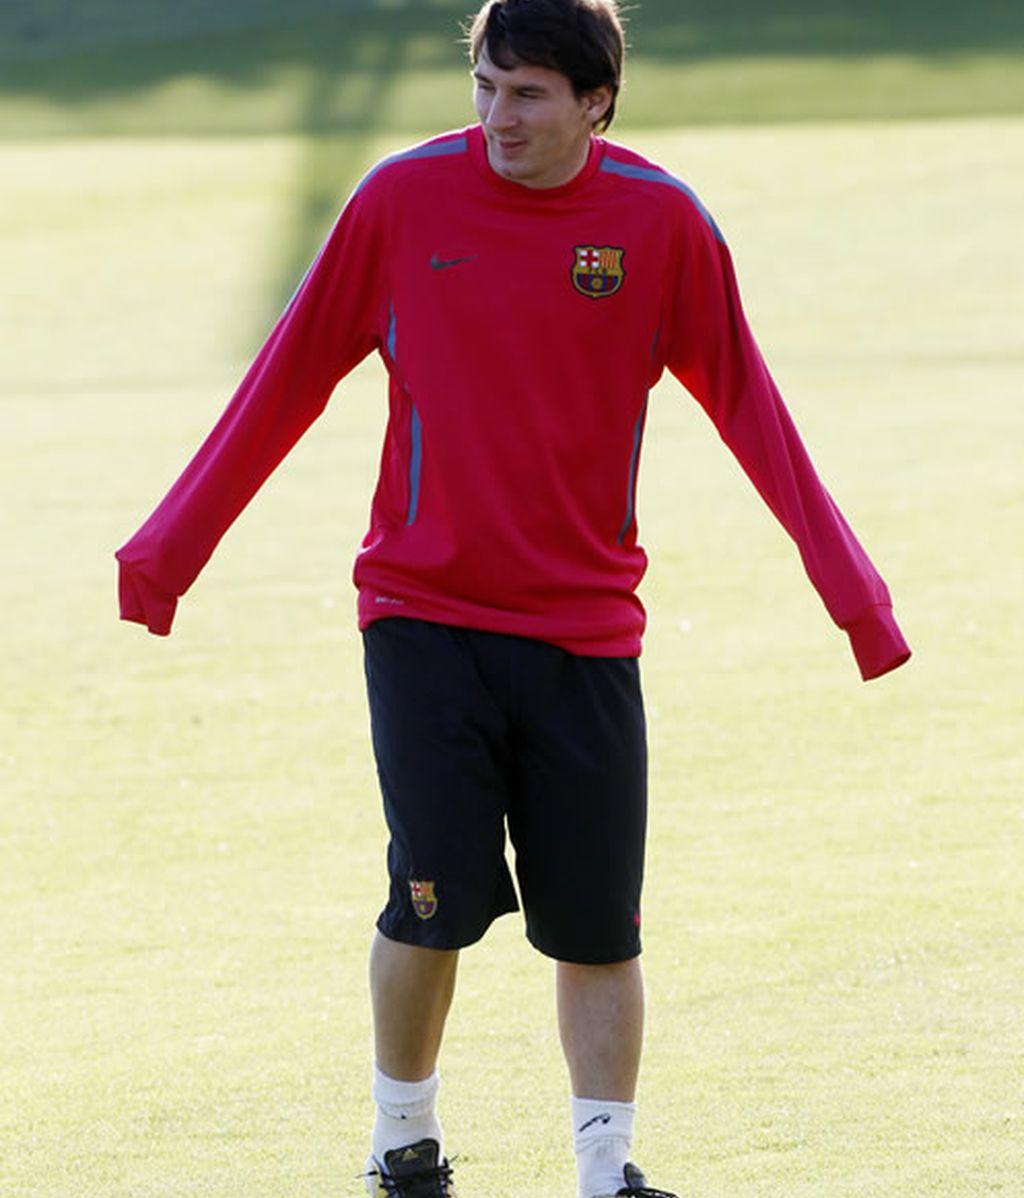 Leo Messi viajó a Kazán sin el alta médica